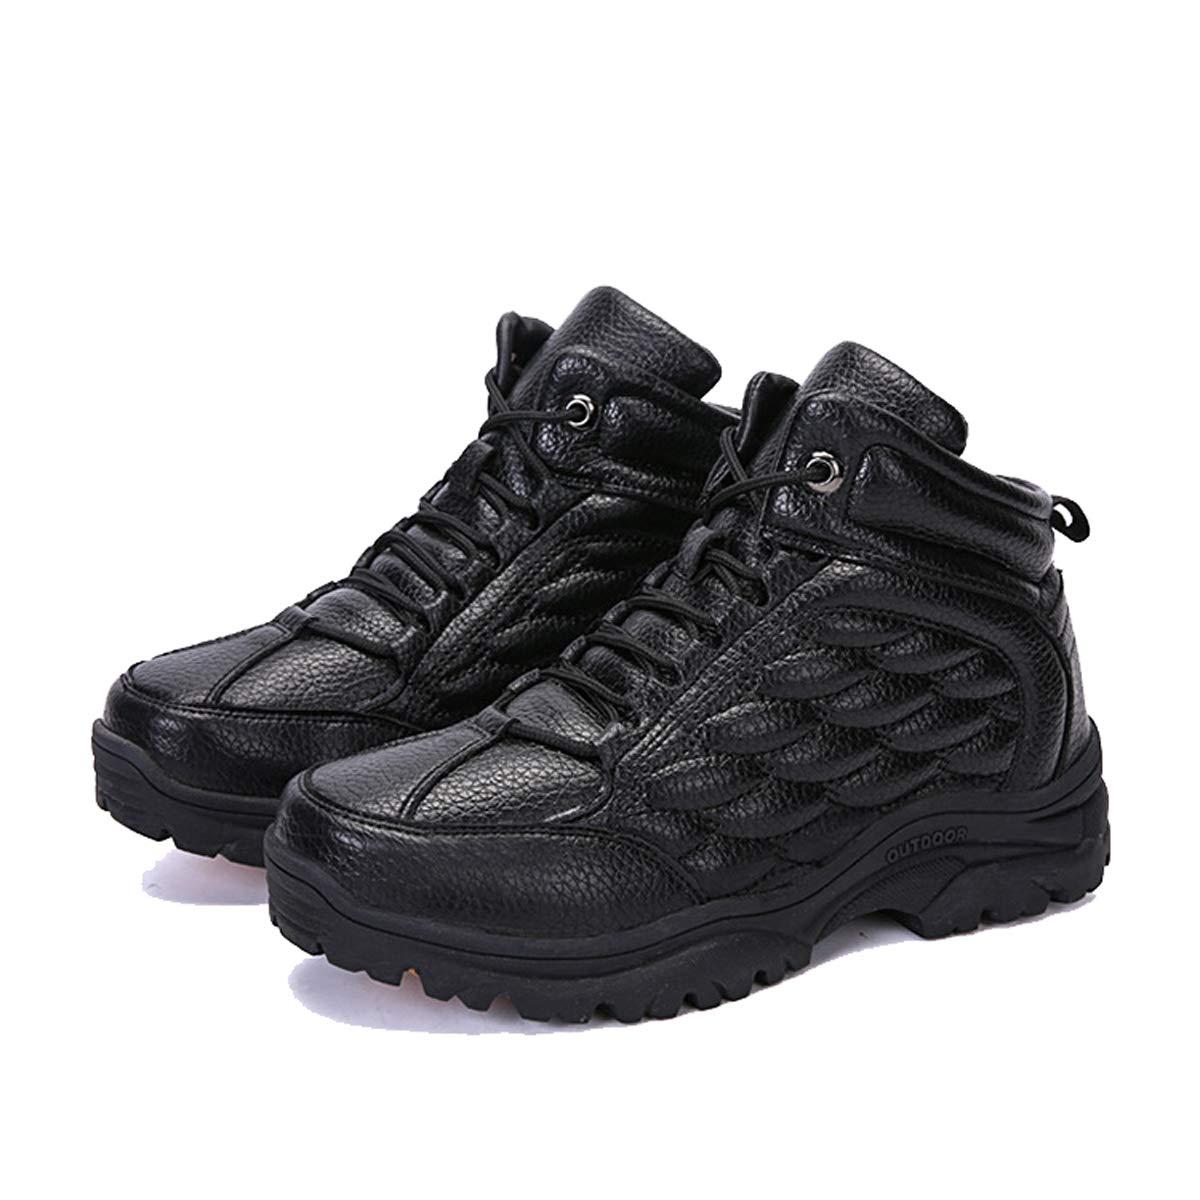 Adong Herren-Wanderschuhe Leder Wasserdichte Schuhe Niedrig-Top-Shosten Leichtbauschuhe für Herbst und Winter,B,41EU